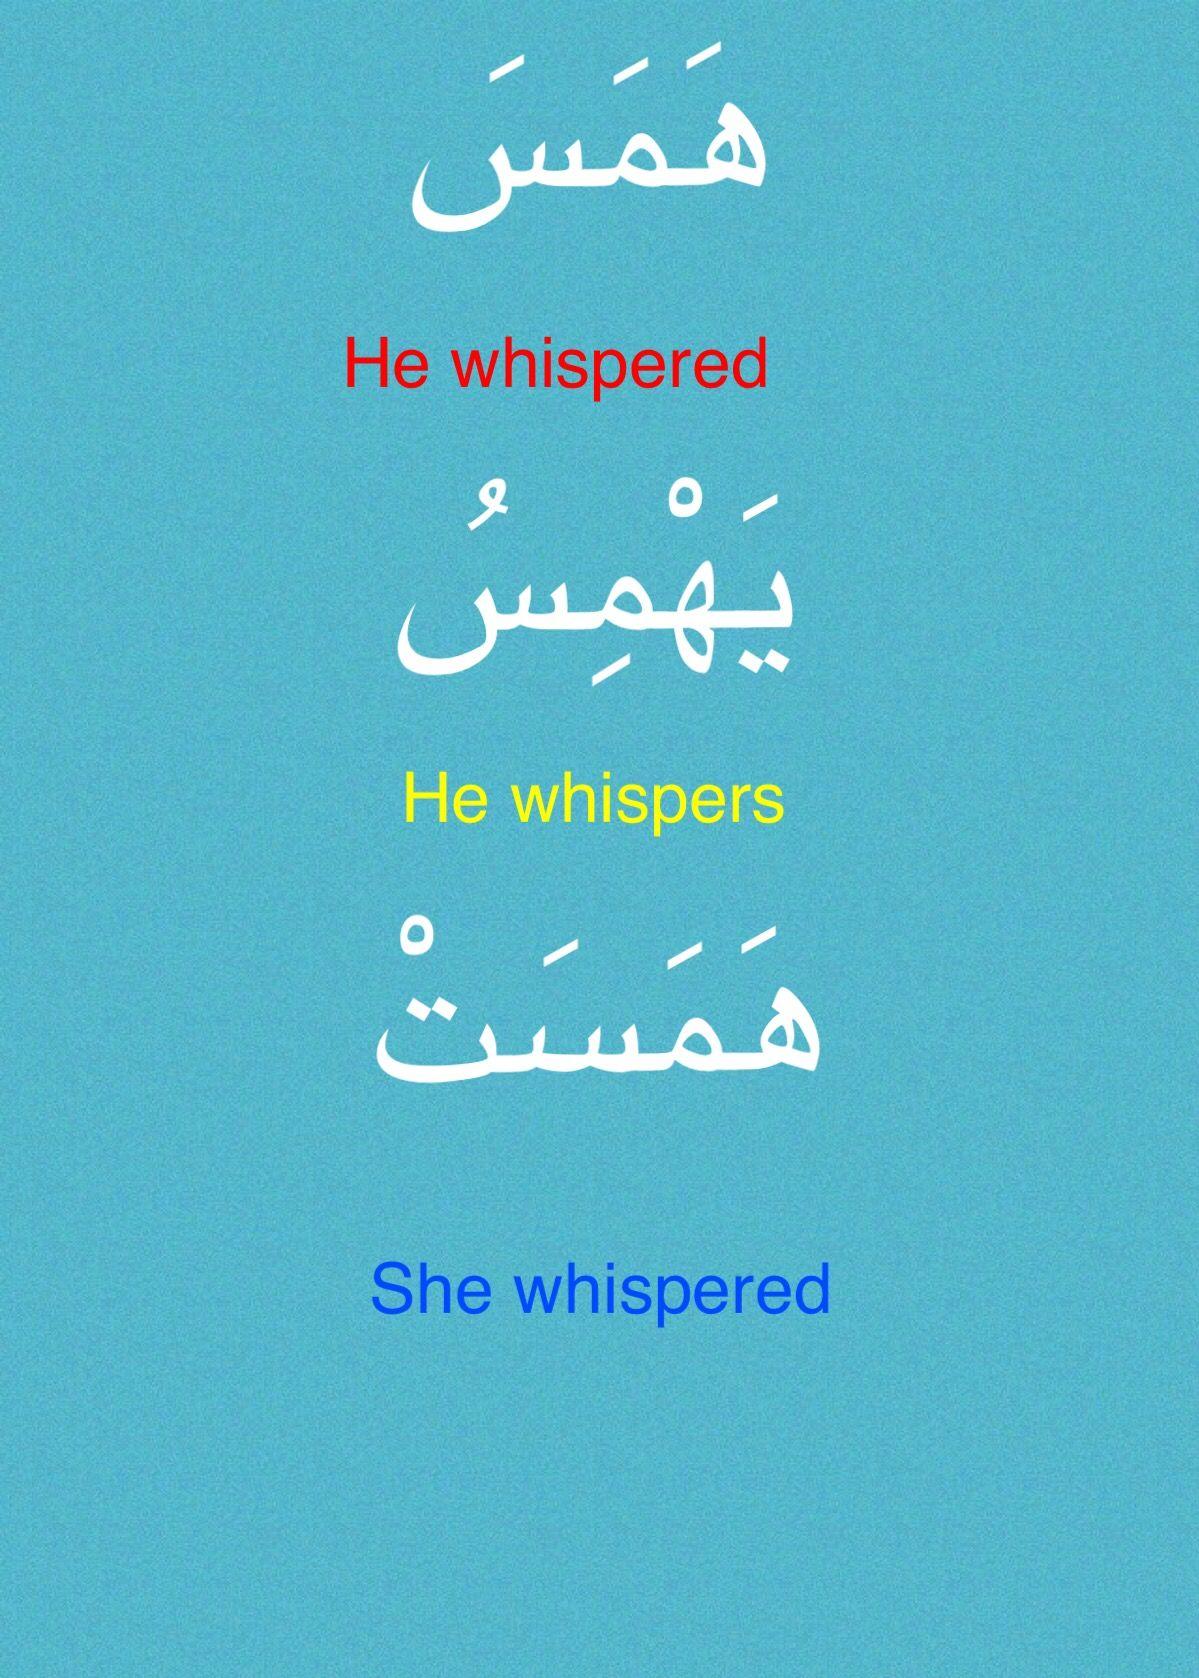 Pin By Jon P On Arabic Learn Arabic Language Arabic Language Learning Arabic